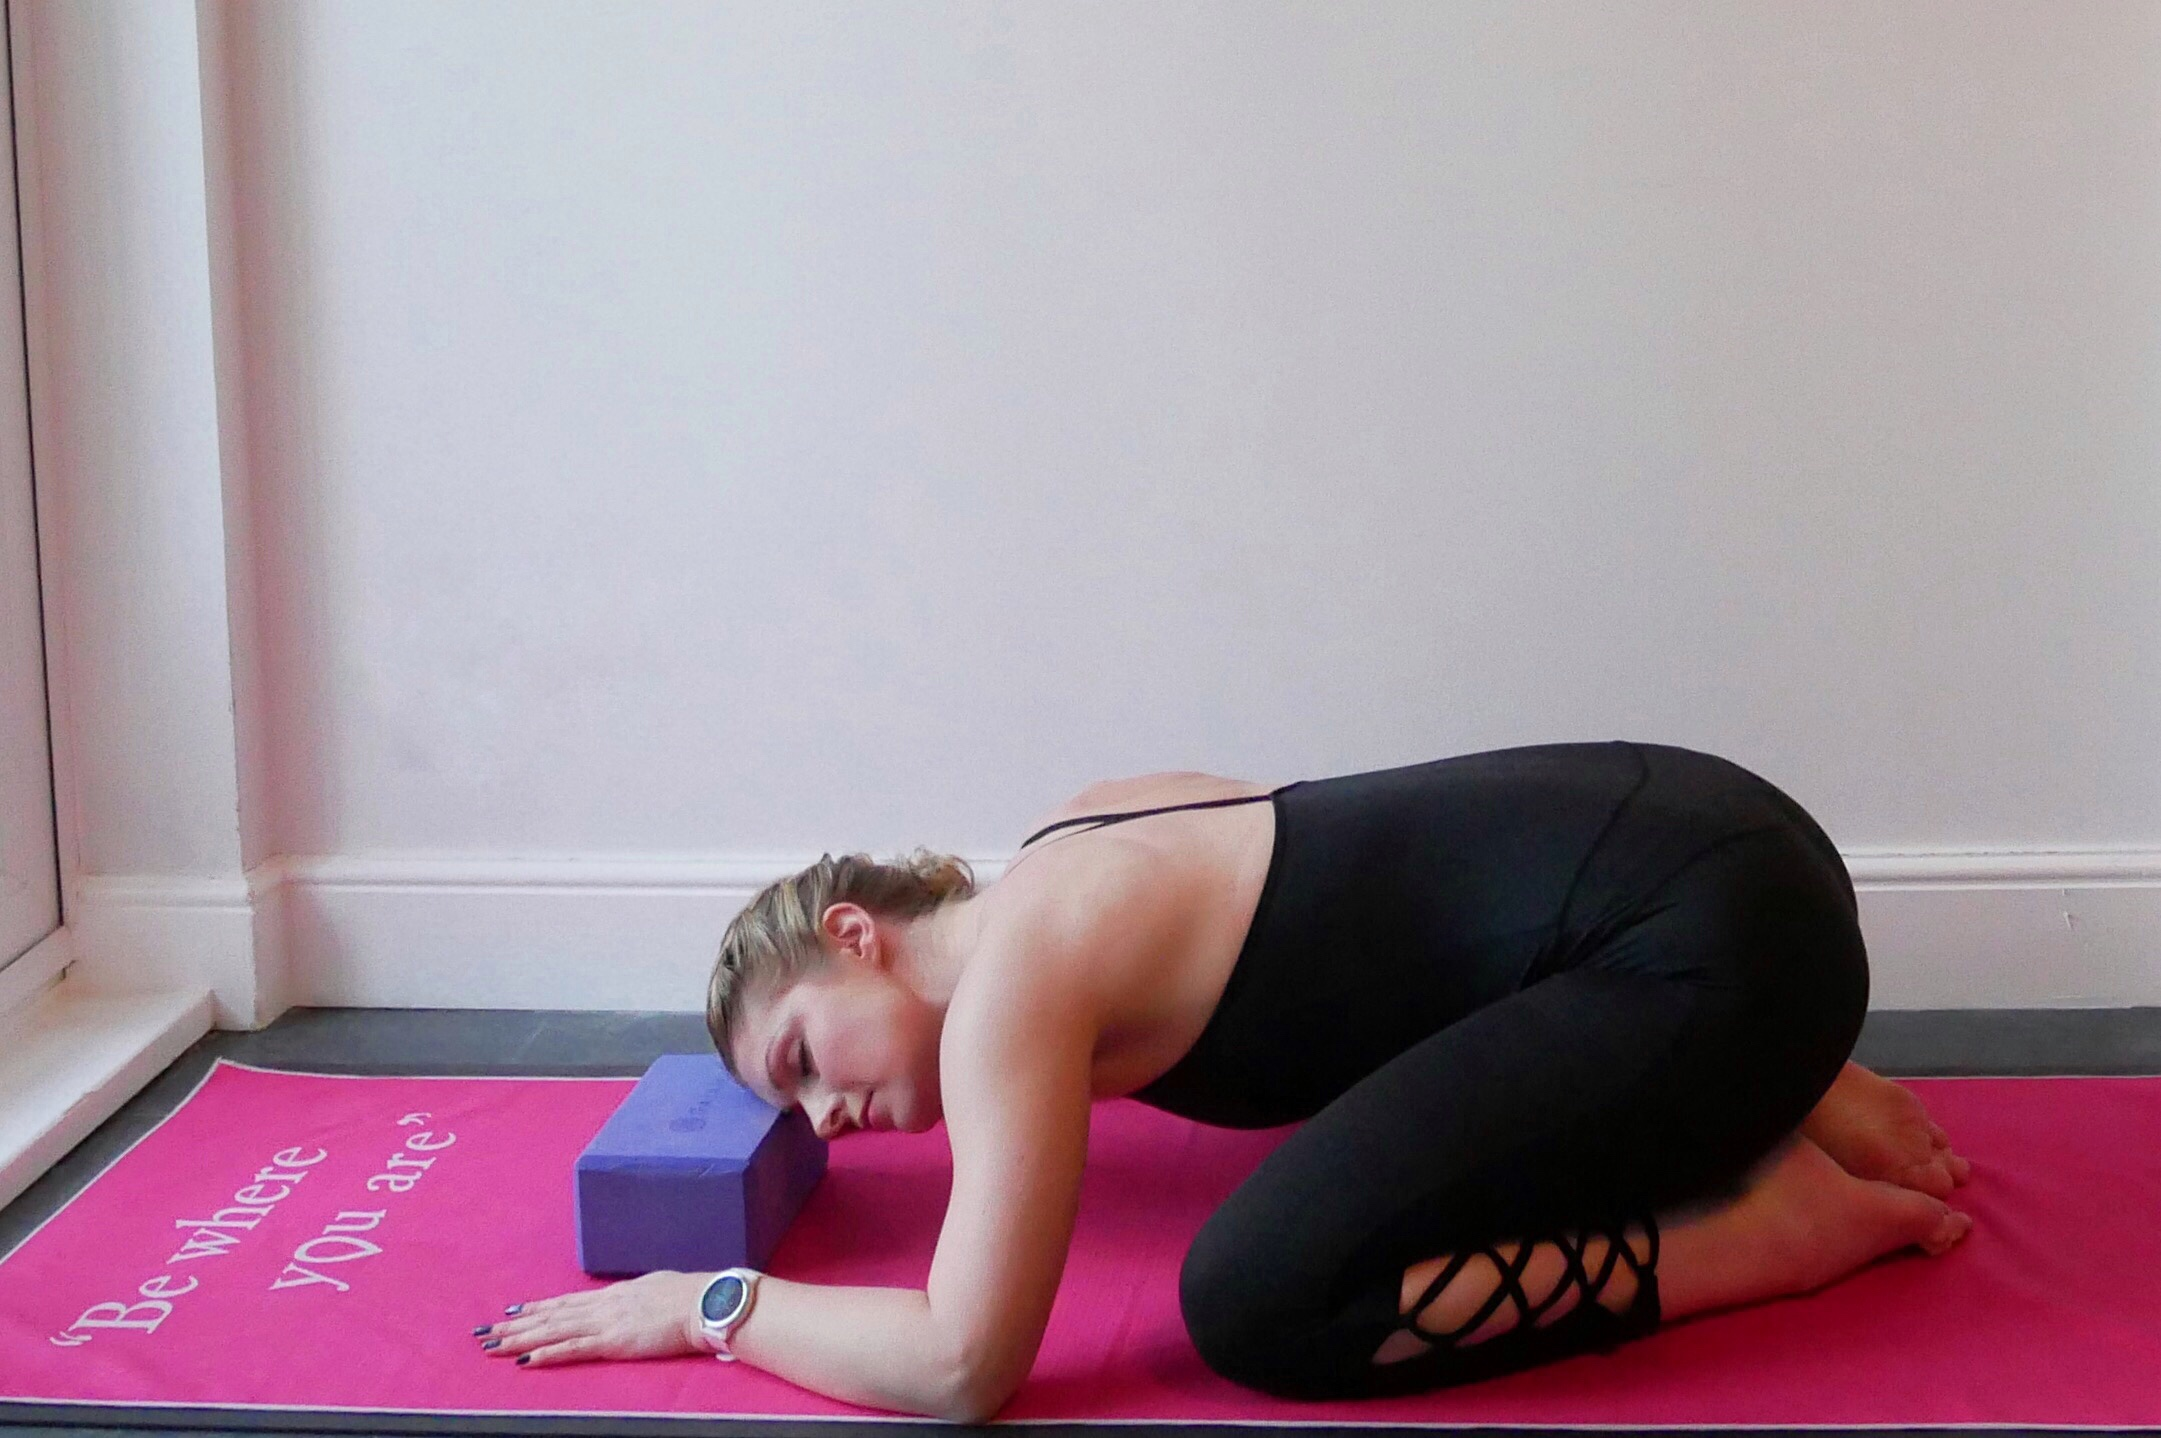 self massage, vagus nerve, vagus nerve massage, anxiety relief, calm the parasympathetic nervous system, calm the body